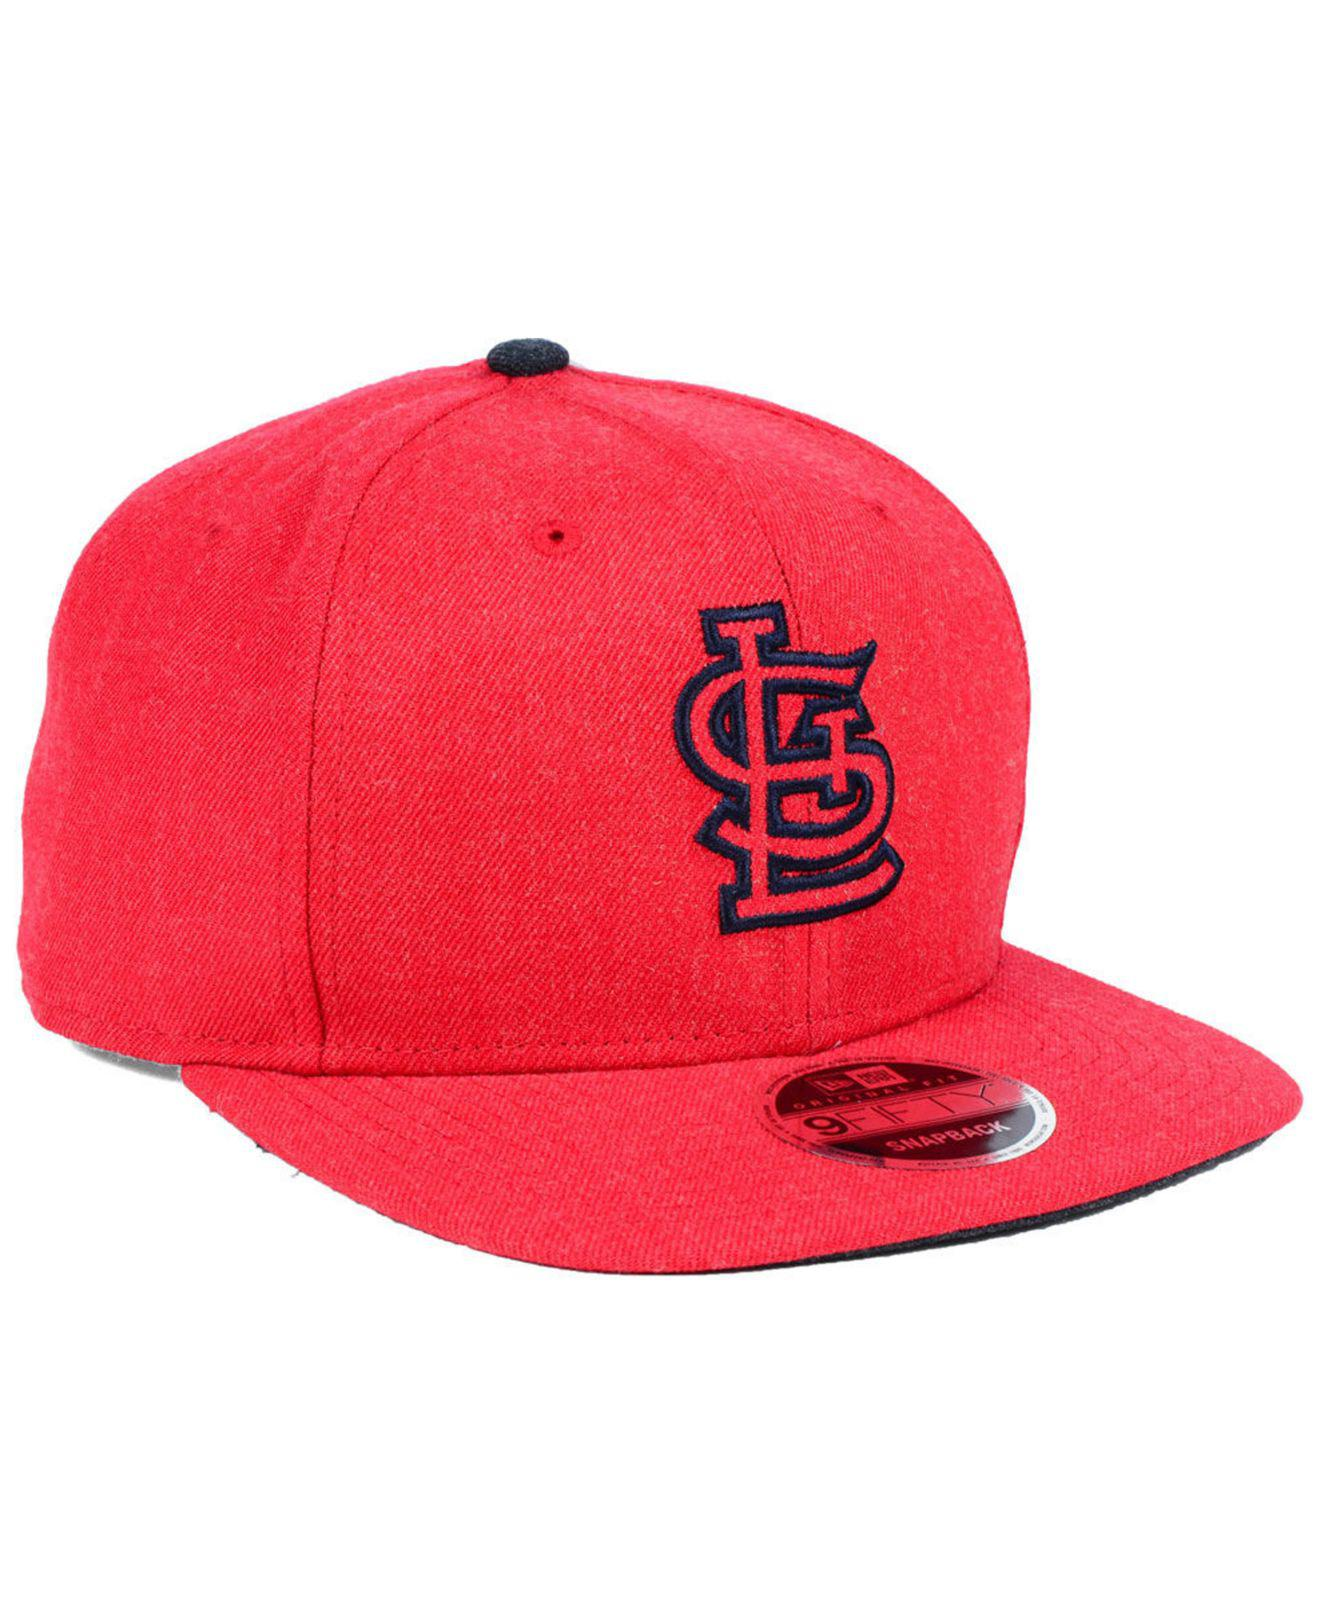 best authentic 45847 13d57 ... get heather hype 9fifty snapback cap for men lyst. view fullscreen  d8665 16590